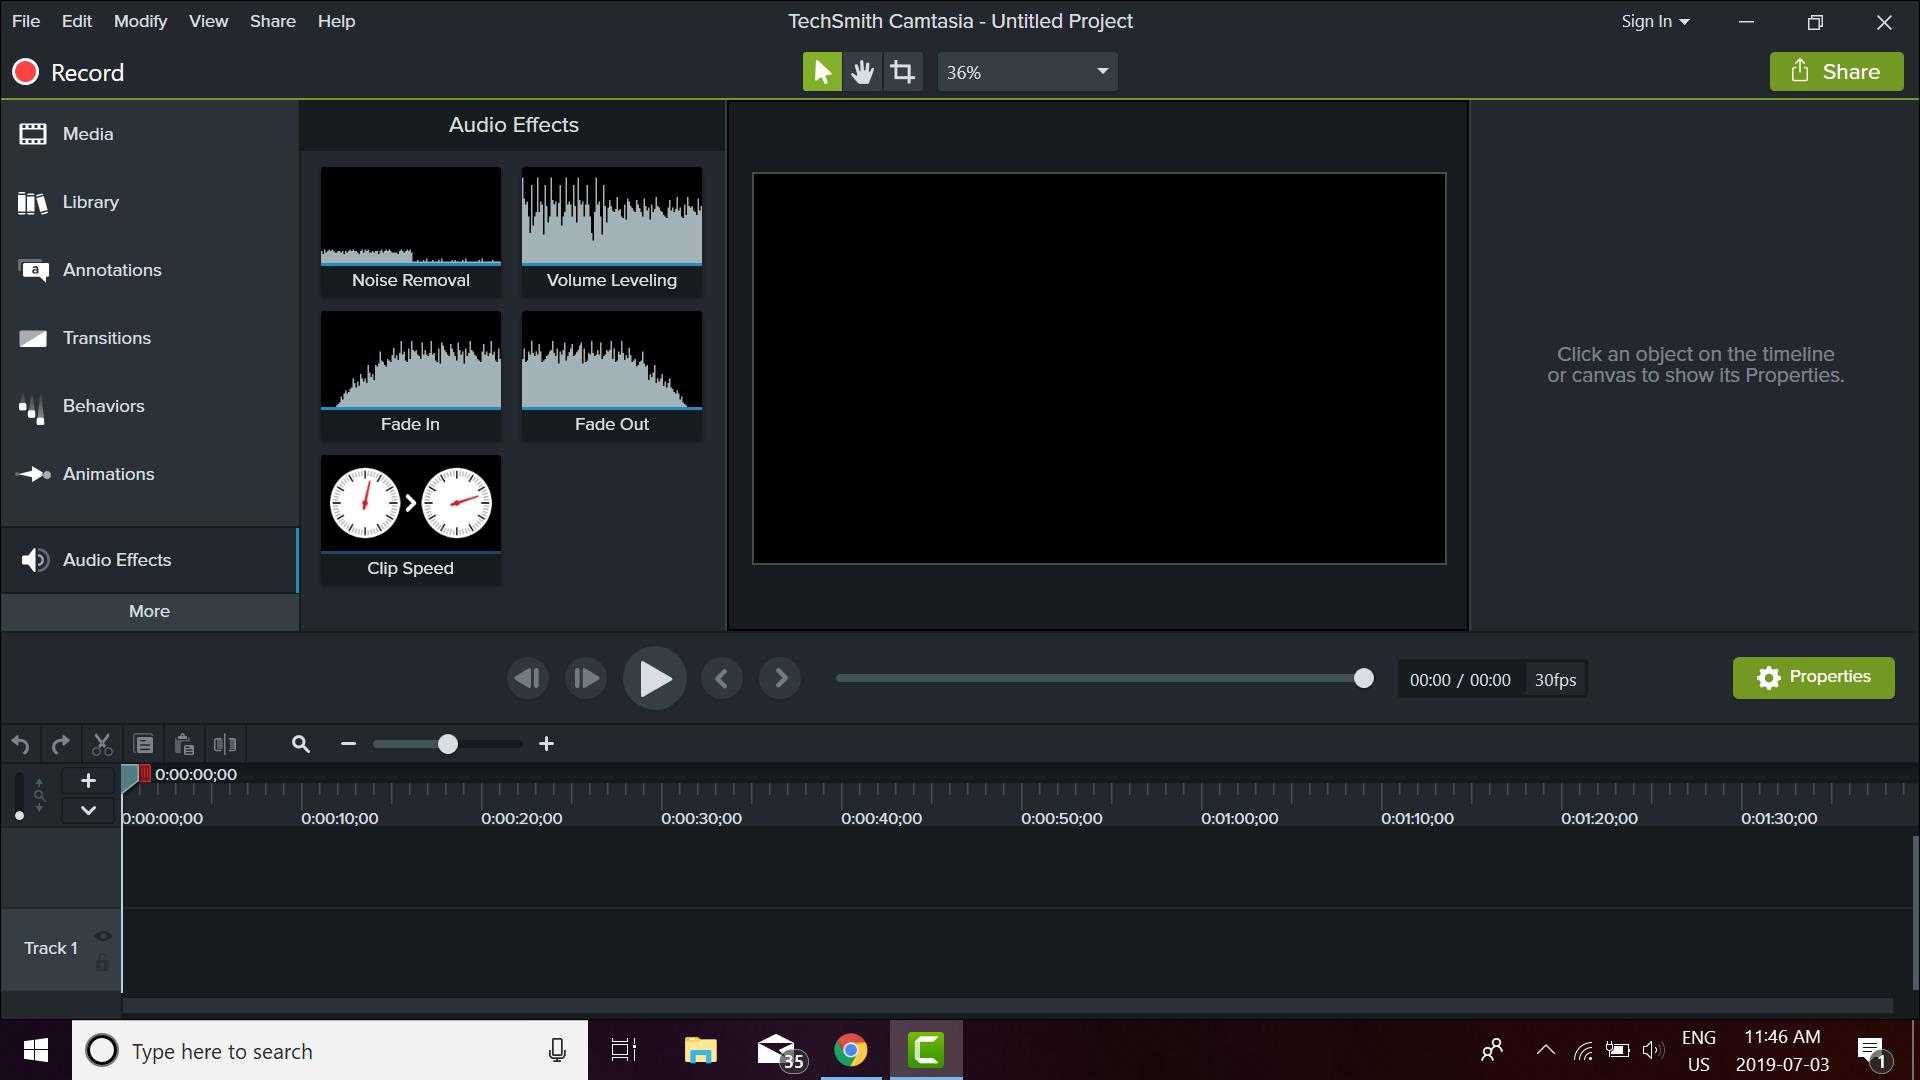 snagit vs camtasia, camtasia audio effects